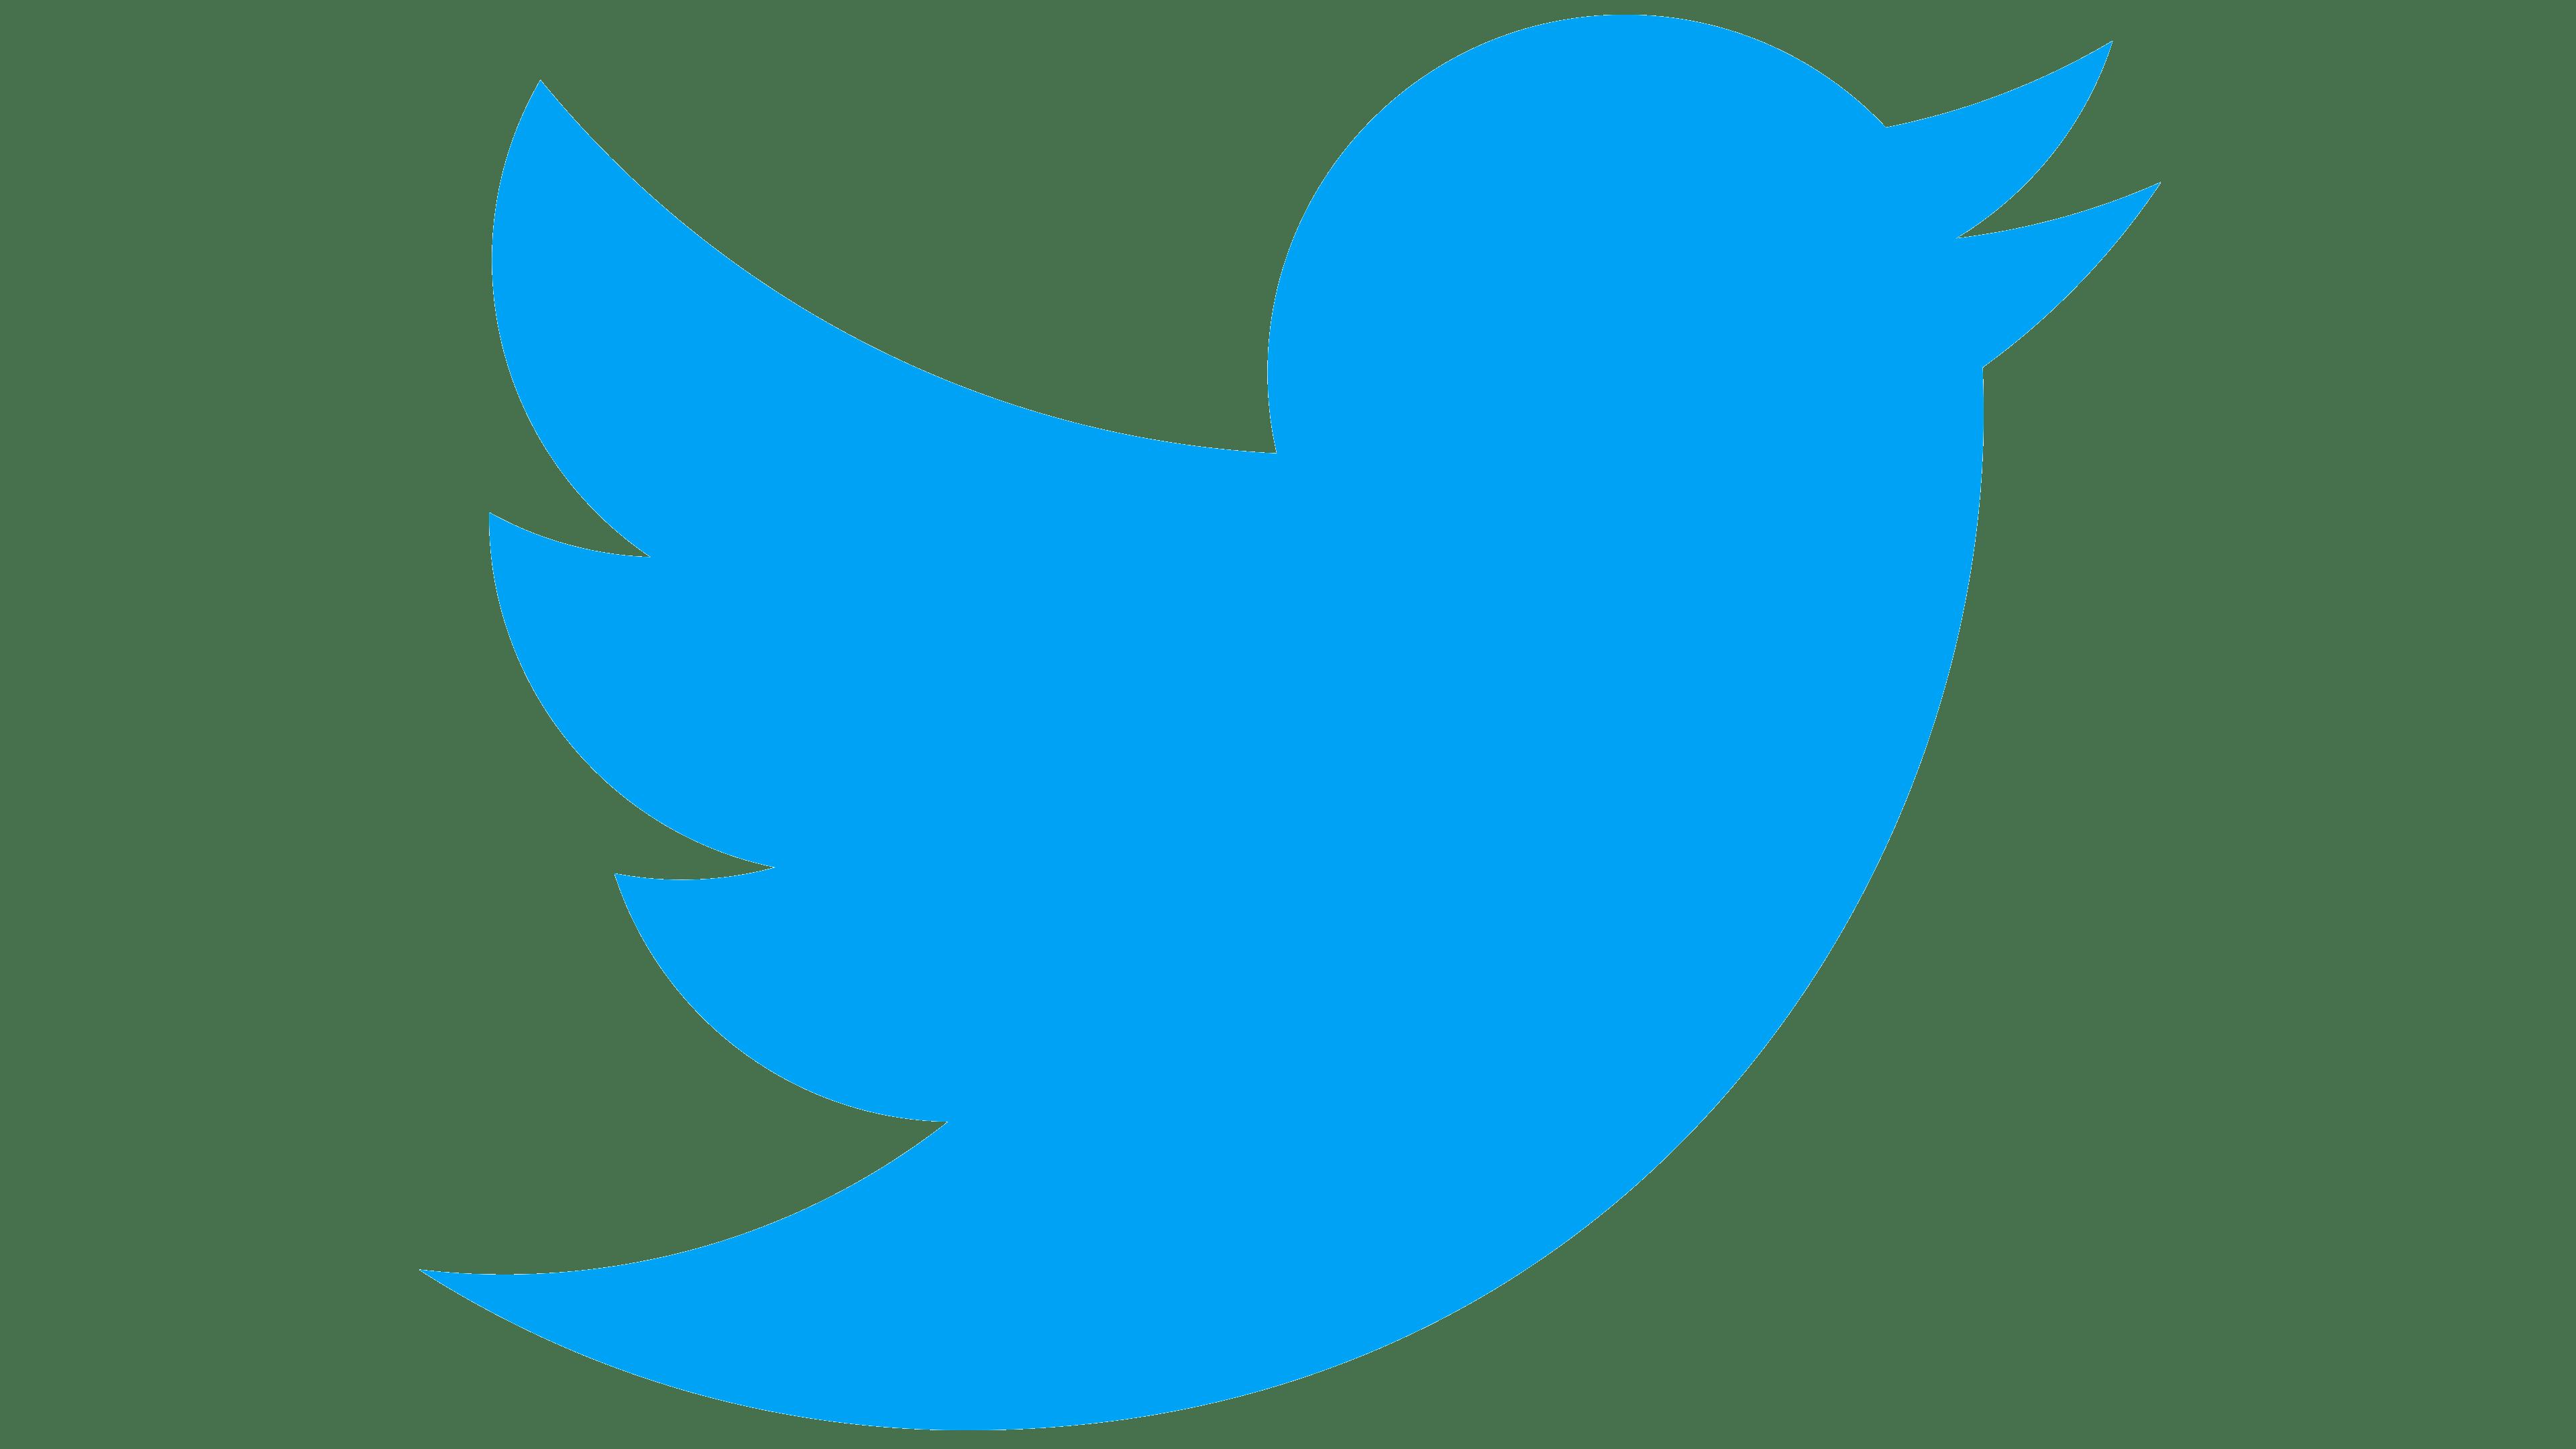 twitter cabinet de conseil Chambéry Annecy savoie